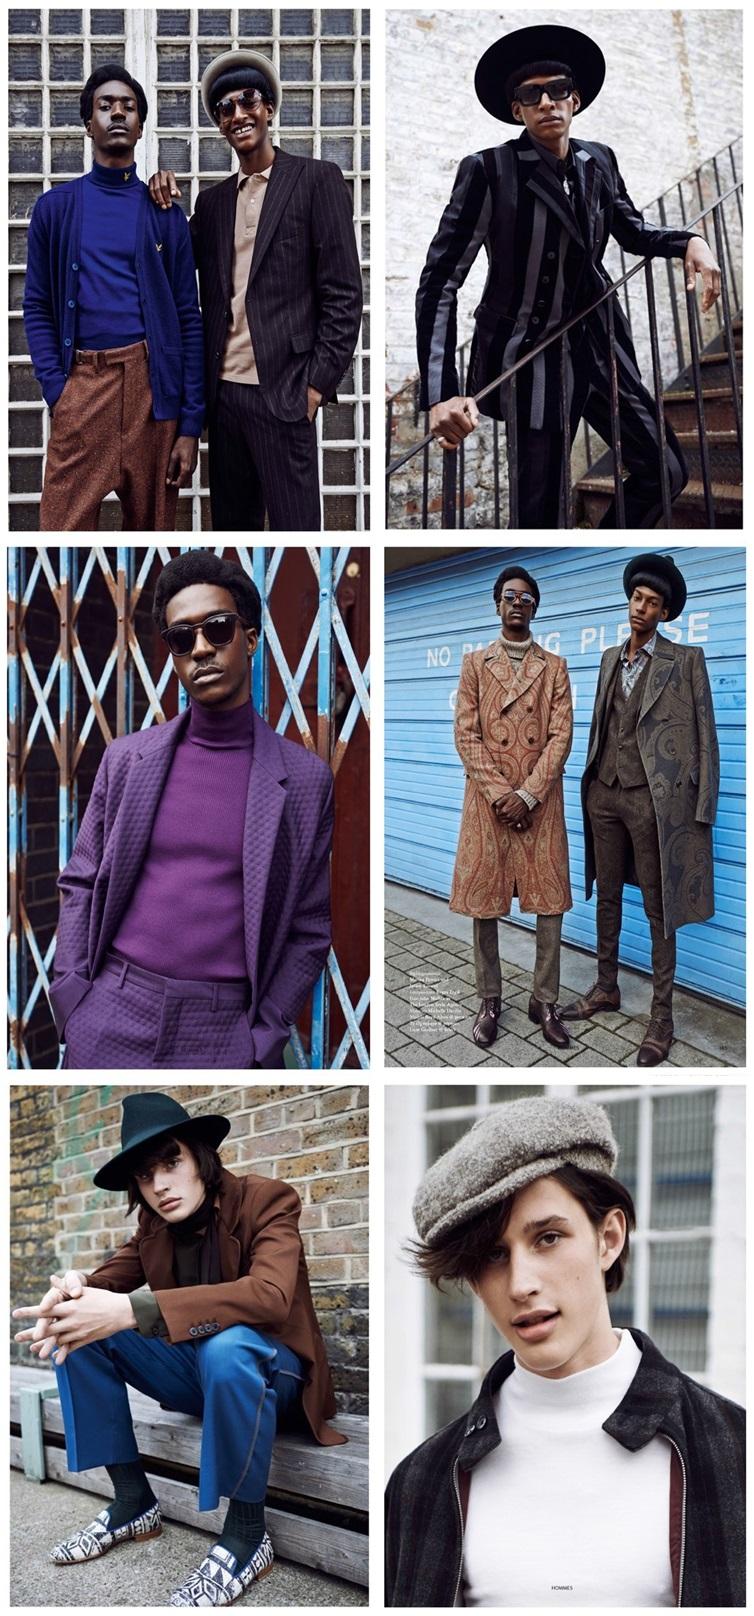 LOfficiel-Hommes-Italia-fashion4addicts.com